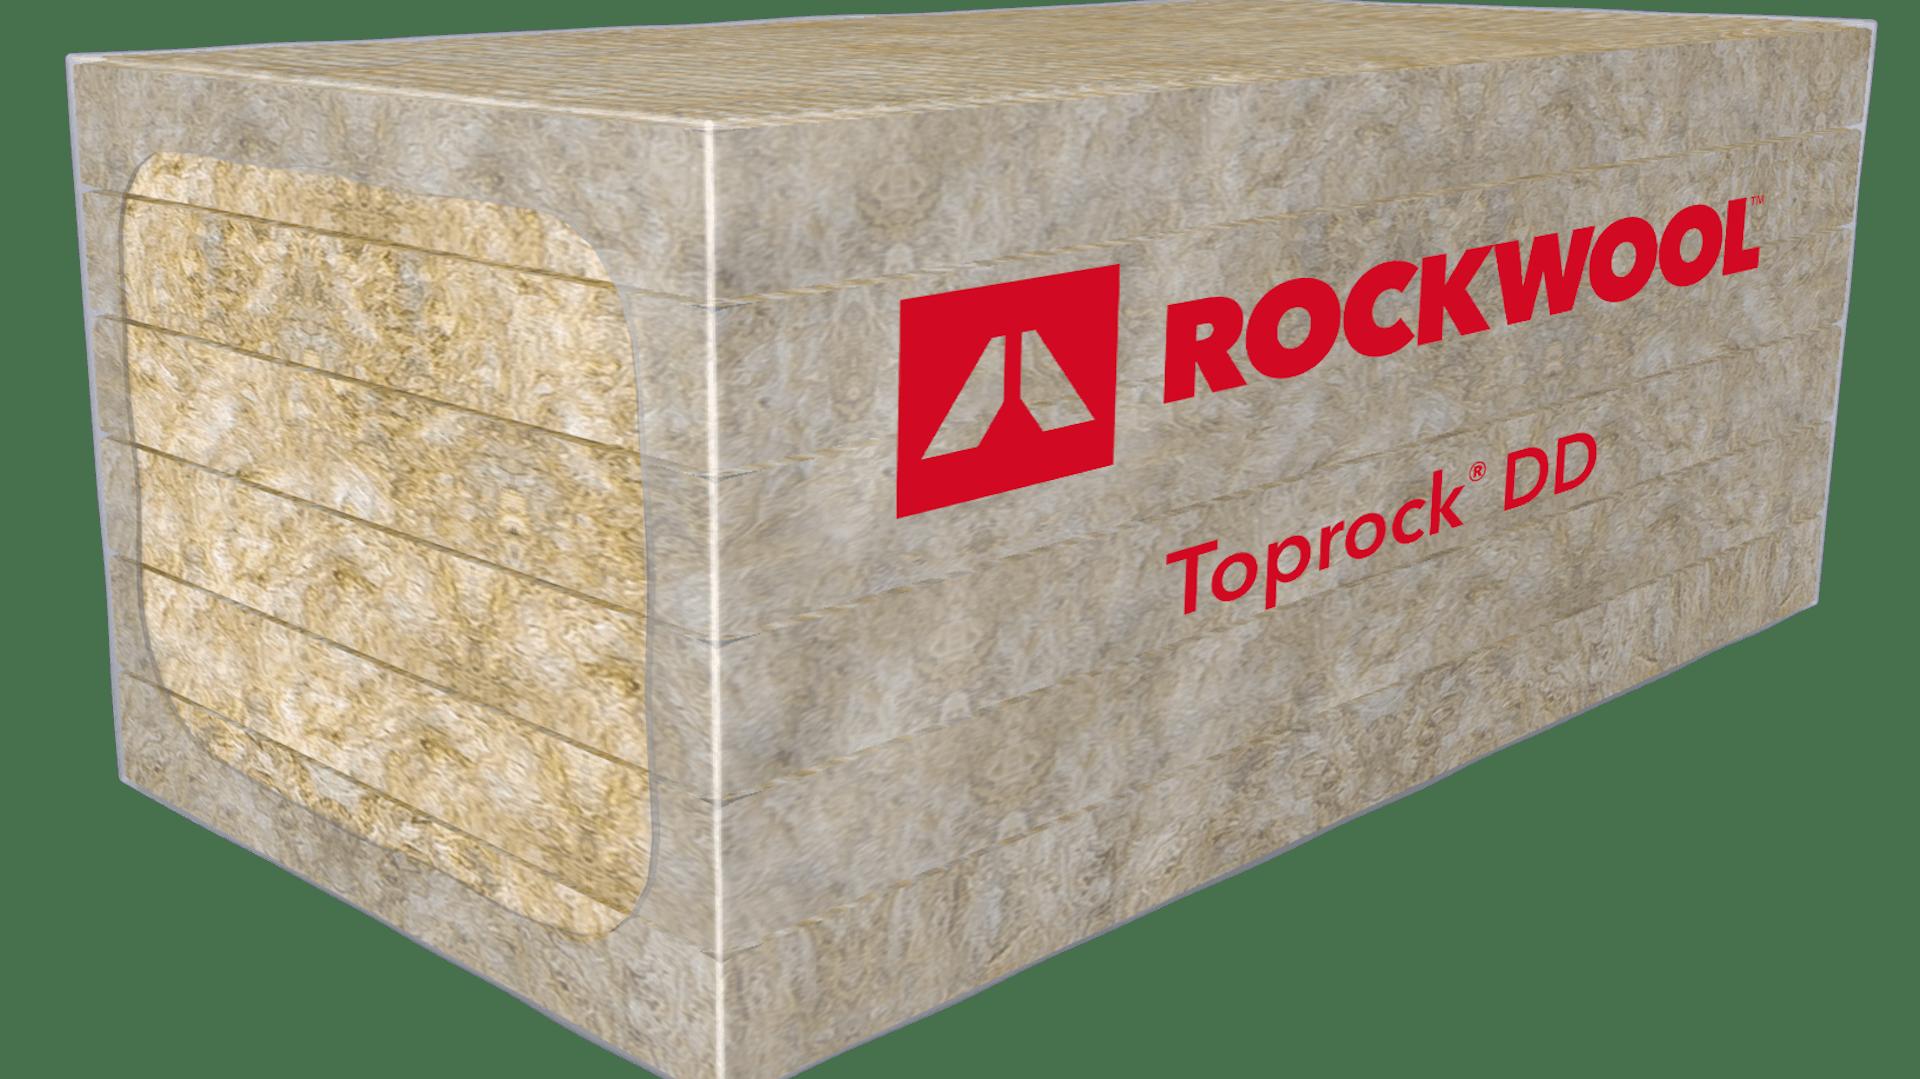 Toprock DD Plus